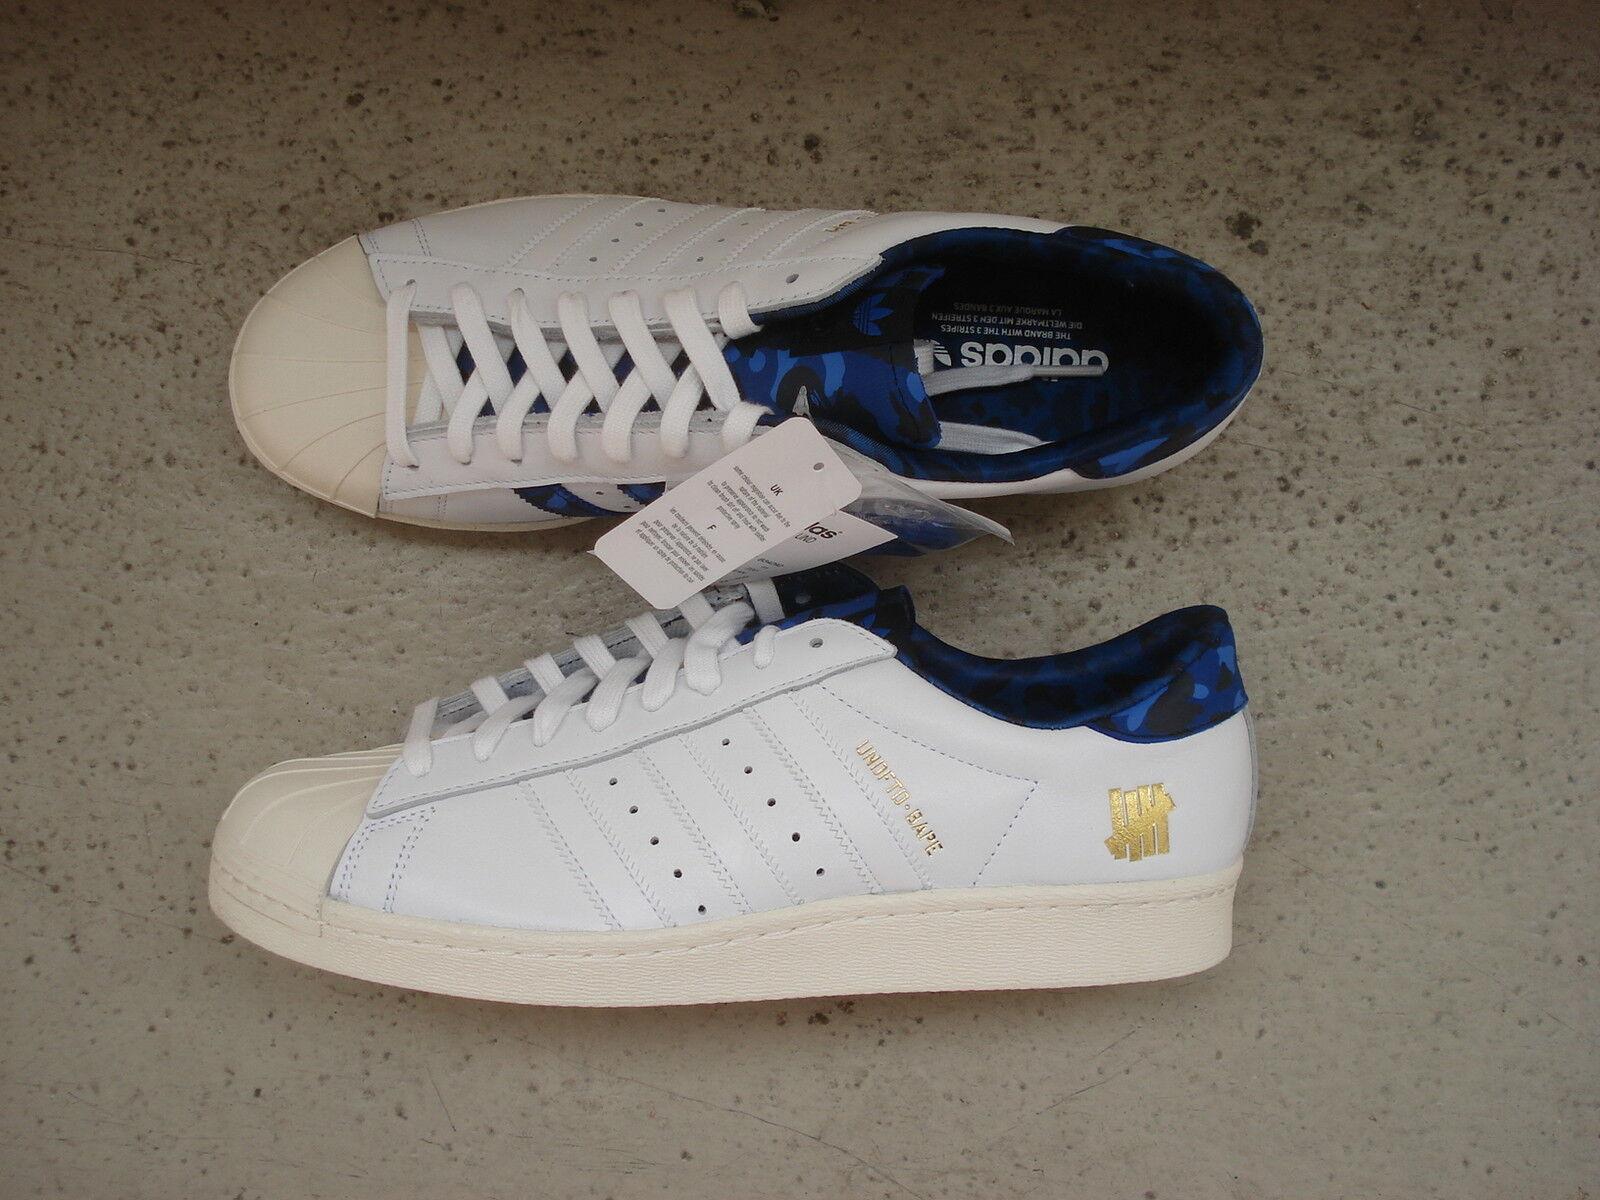 Adidas Superstar Consortium x Bape x undefeated 46 blanco blanco camo